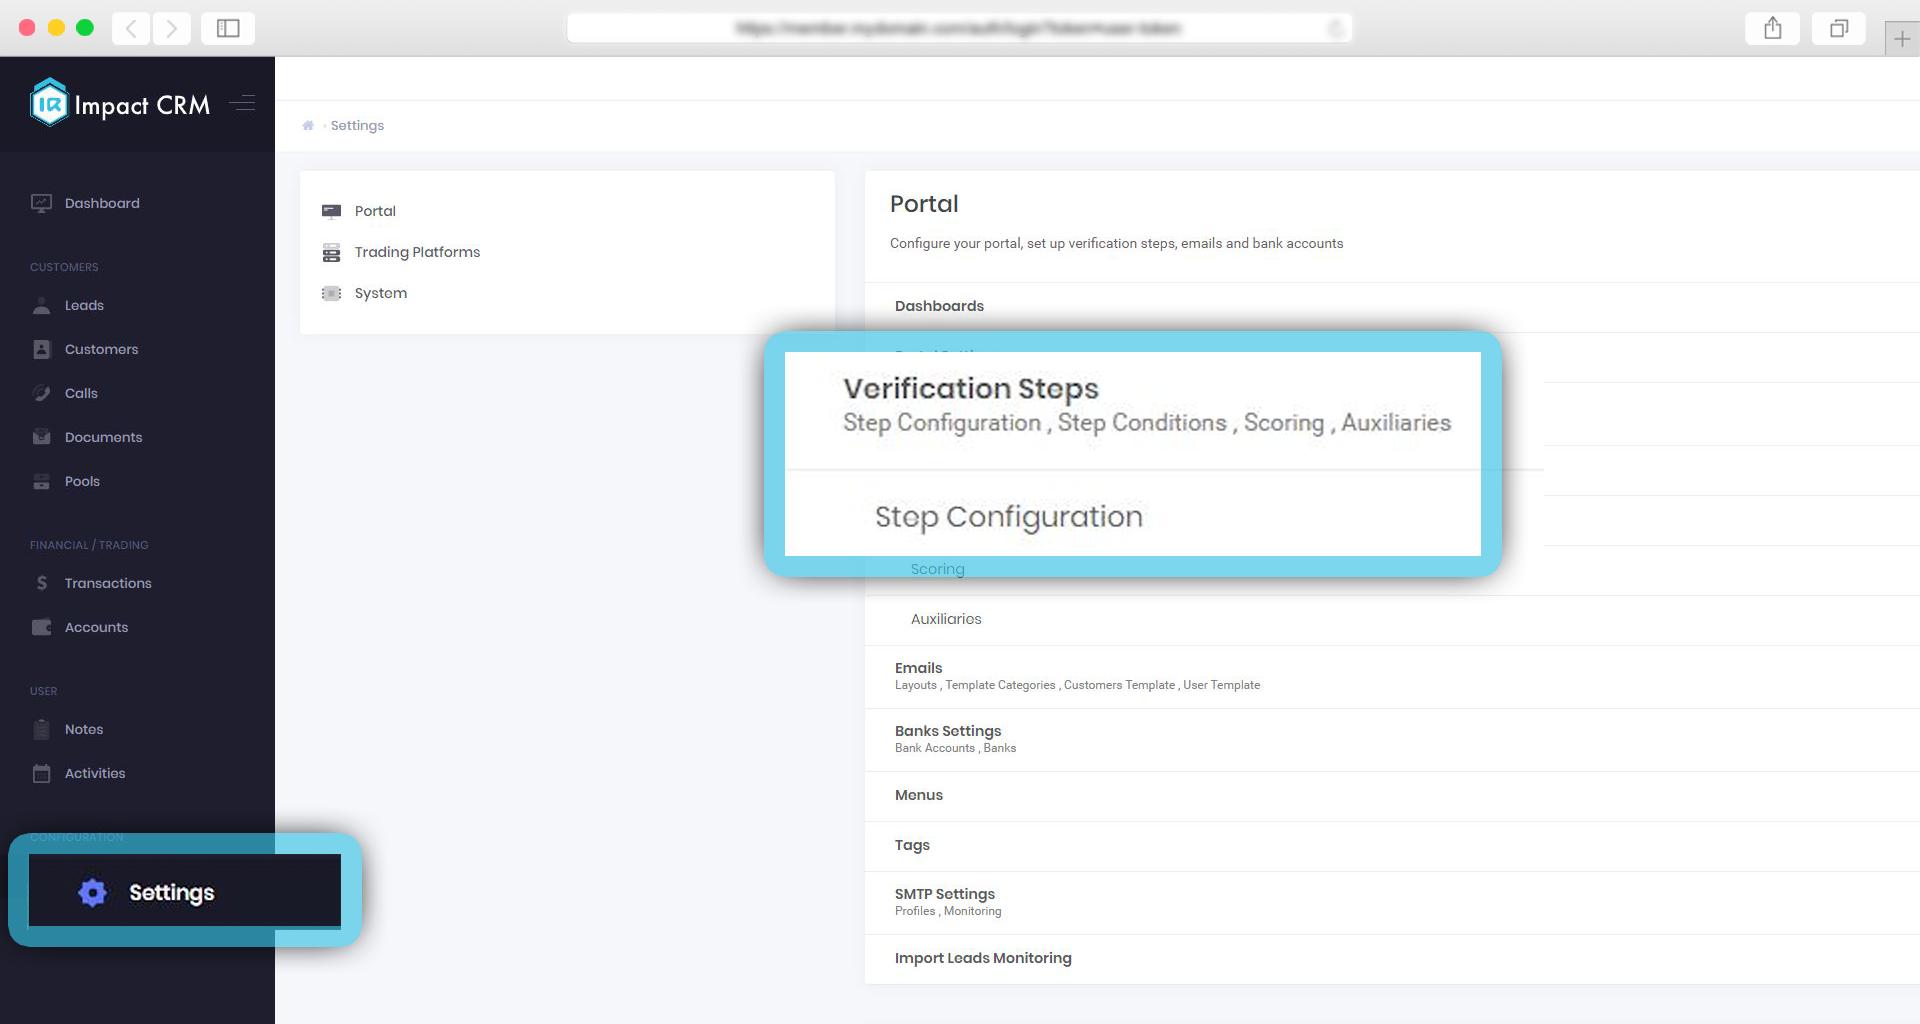 We added Custom HTML type on verification steps